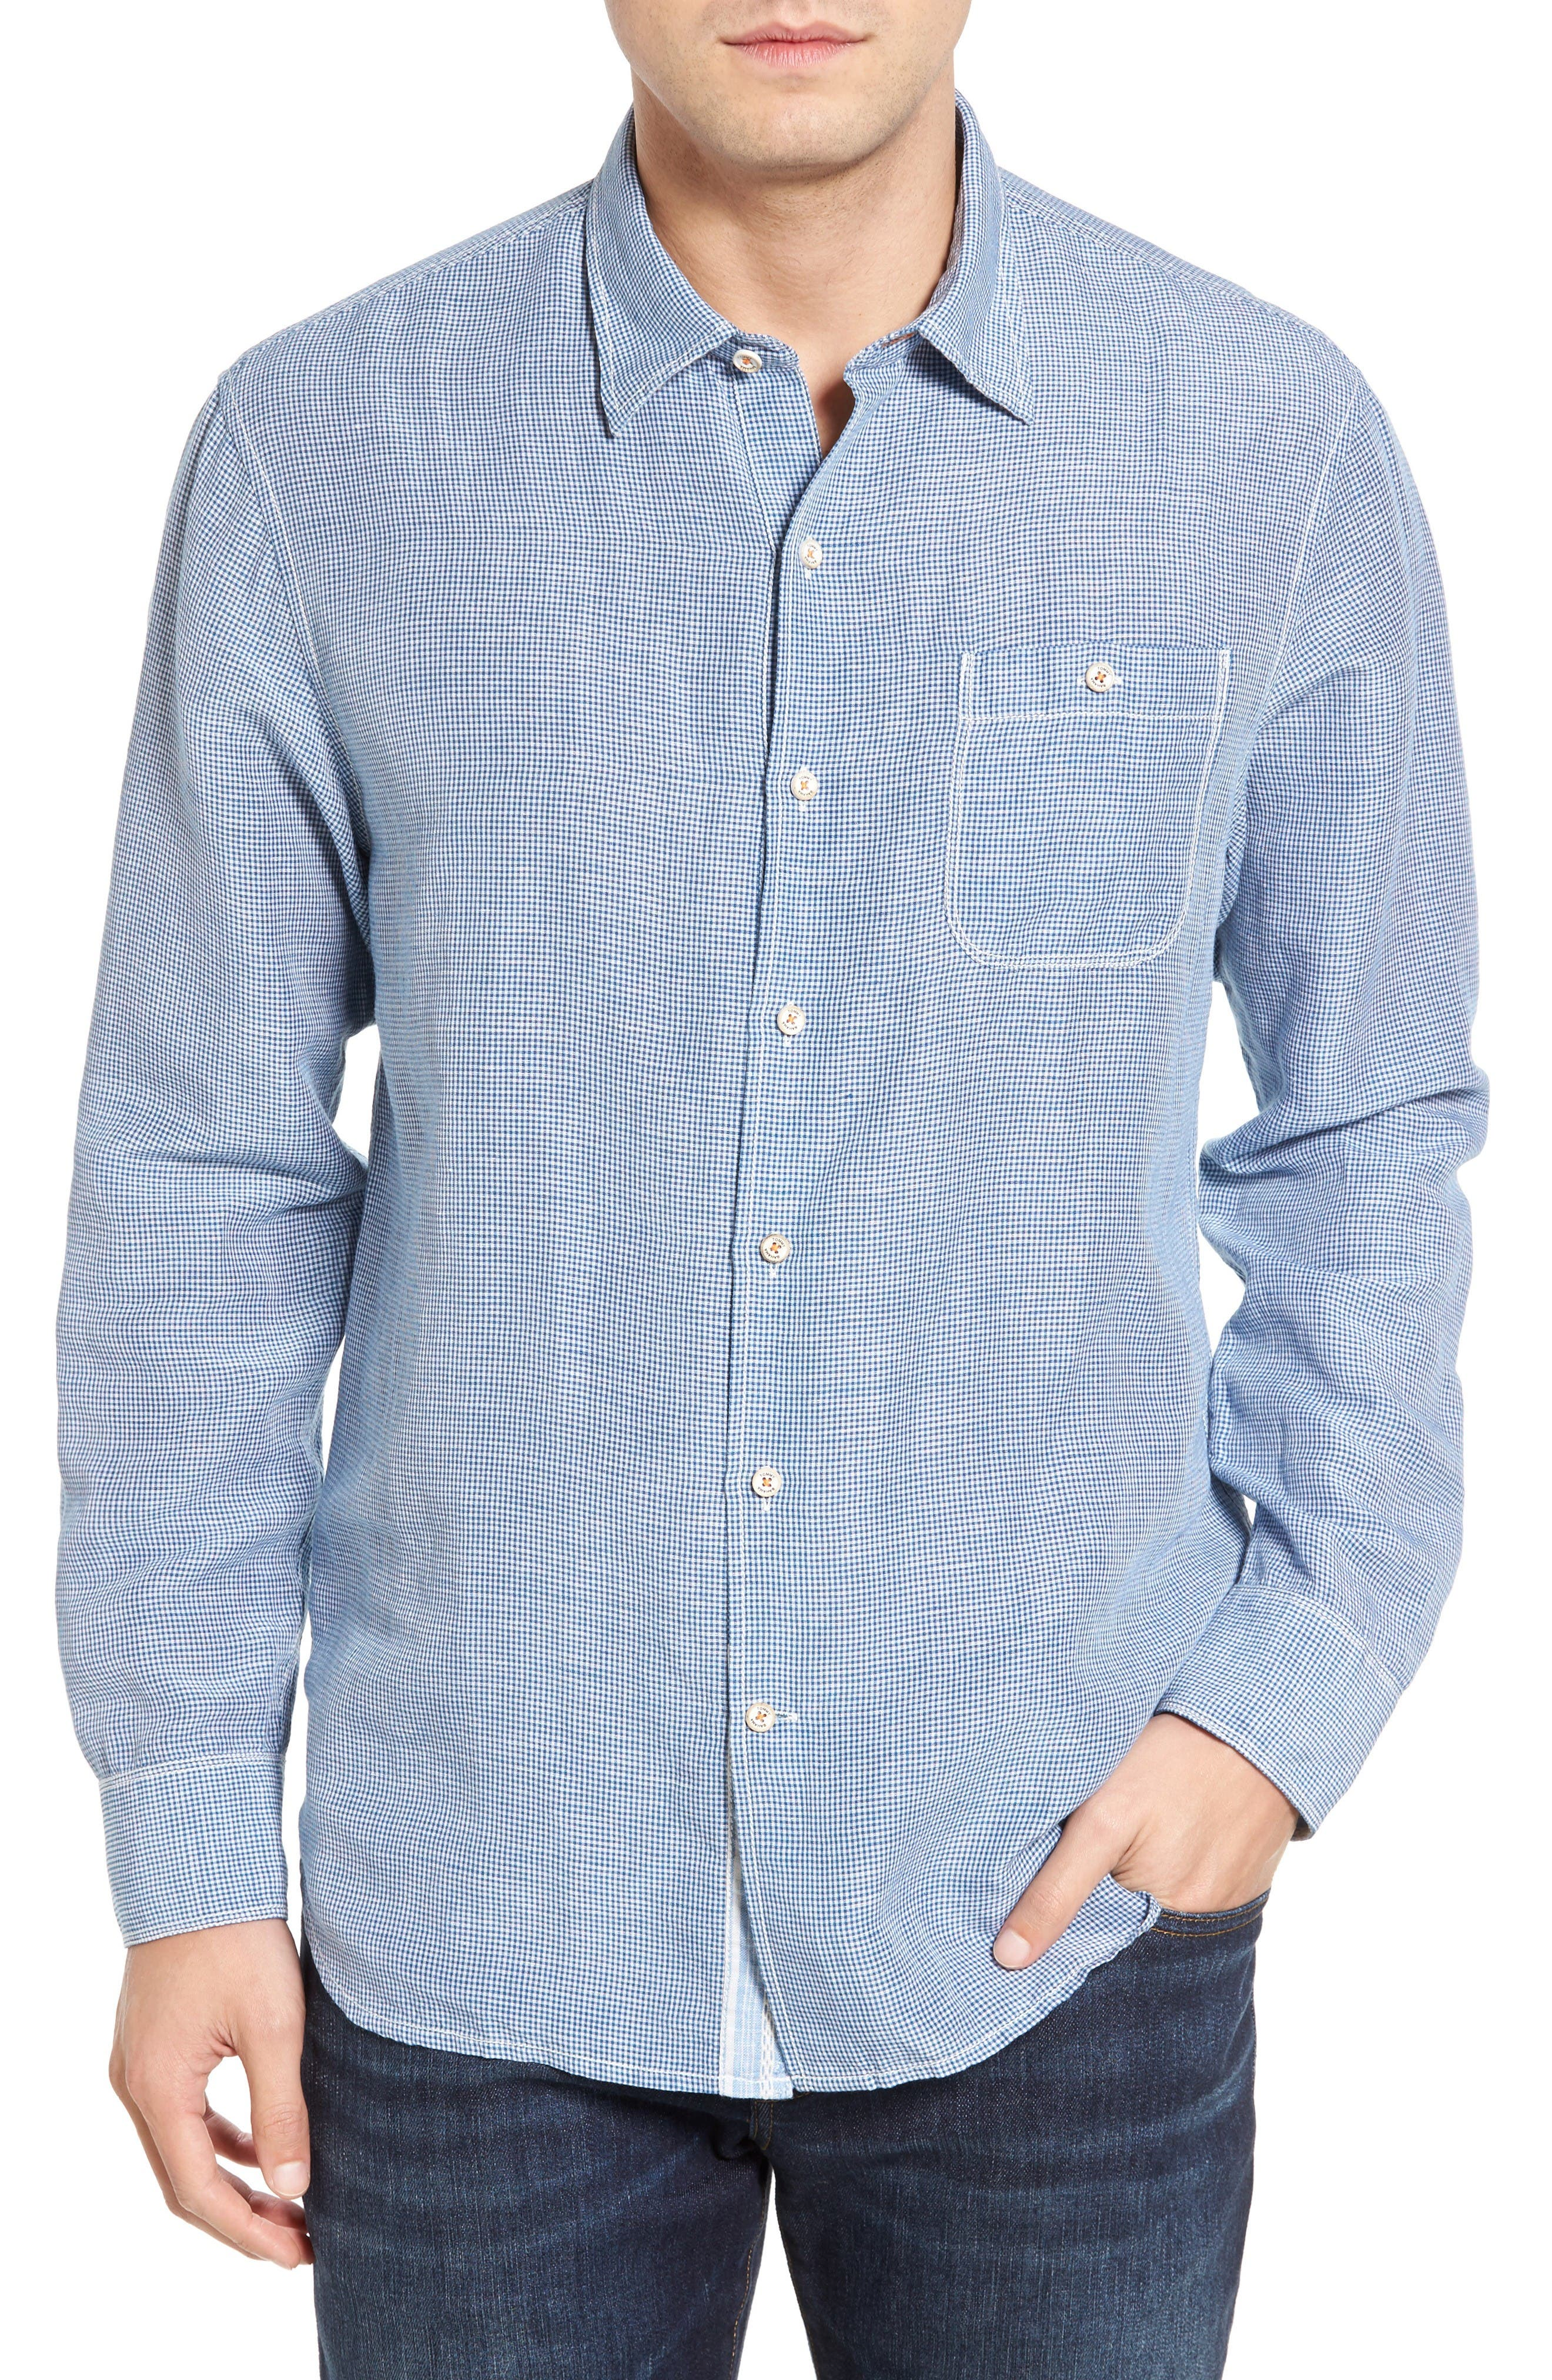 Sand Linen Island Modern Fit Sport Shirt,                             Main thumbnail 1, color,                             Bering Blue